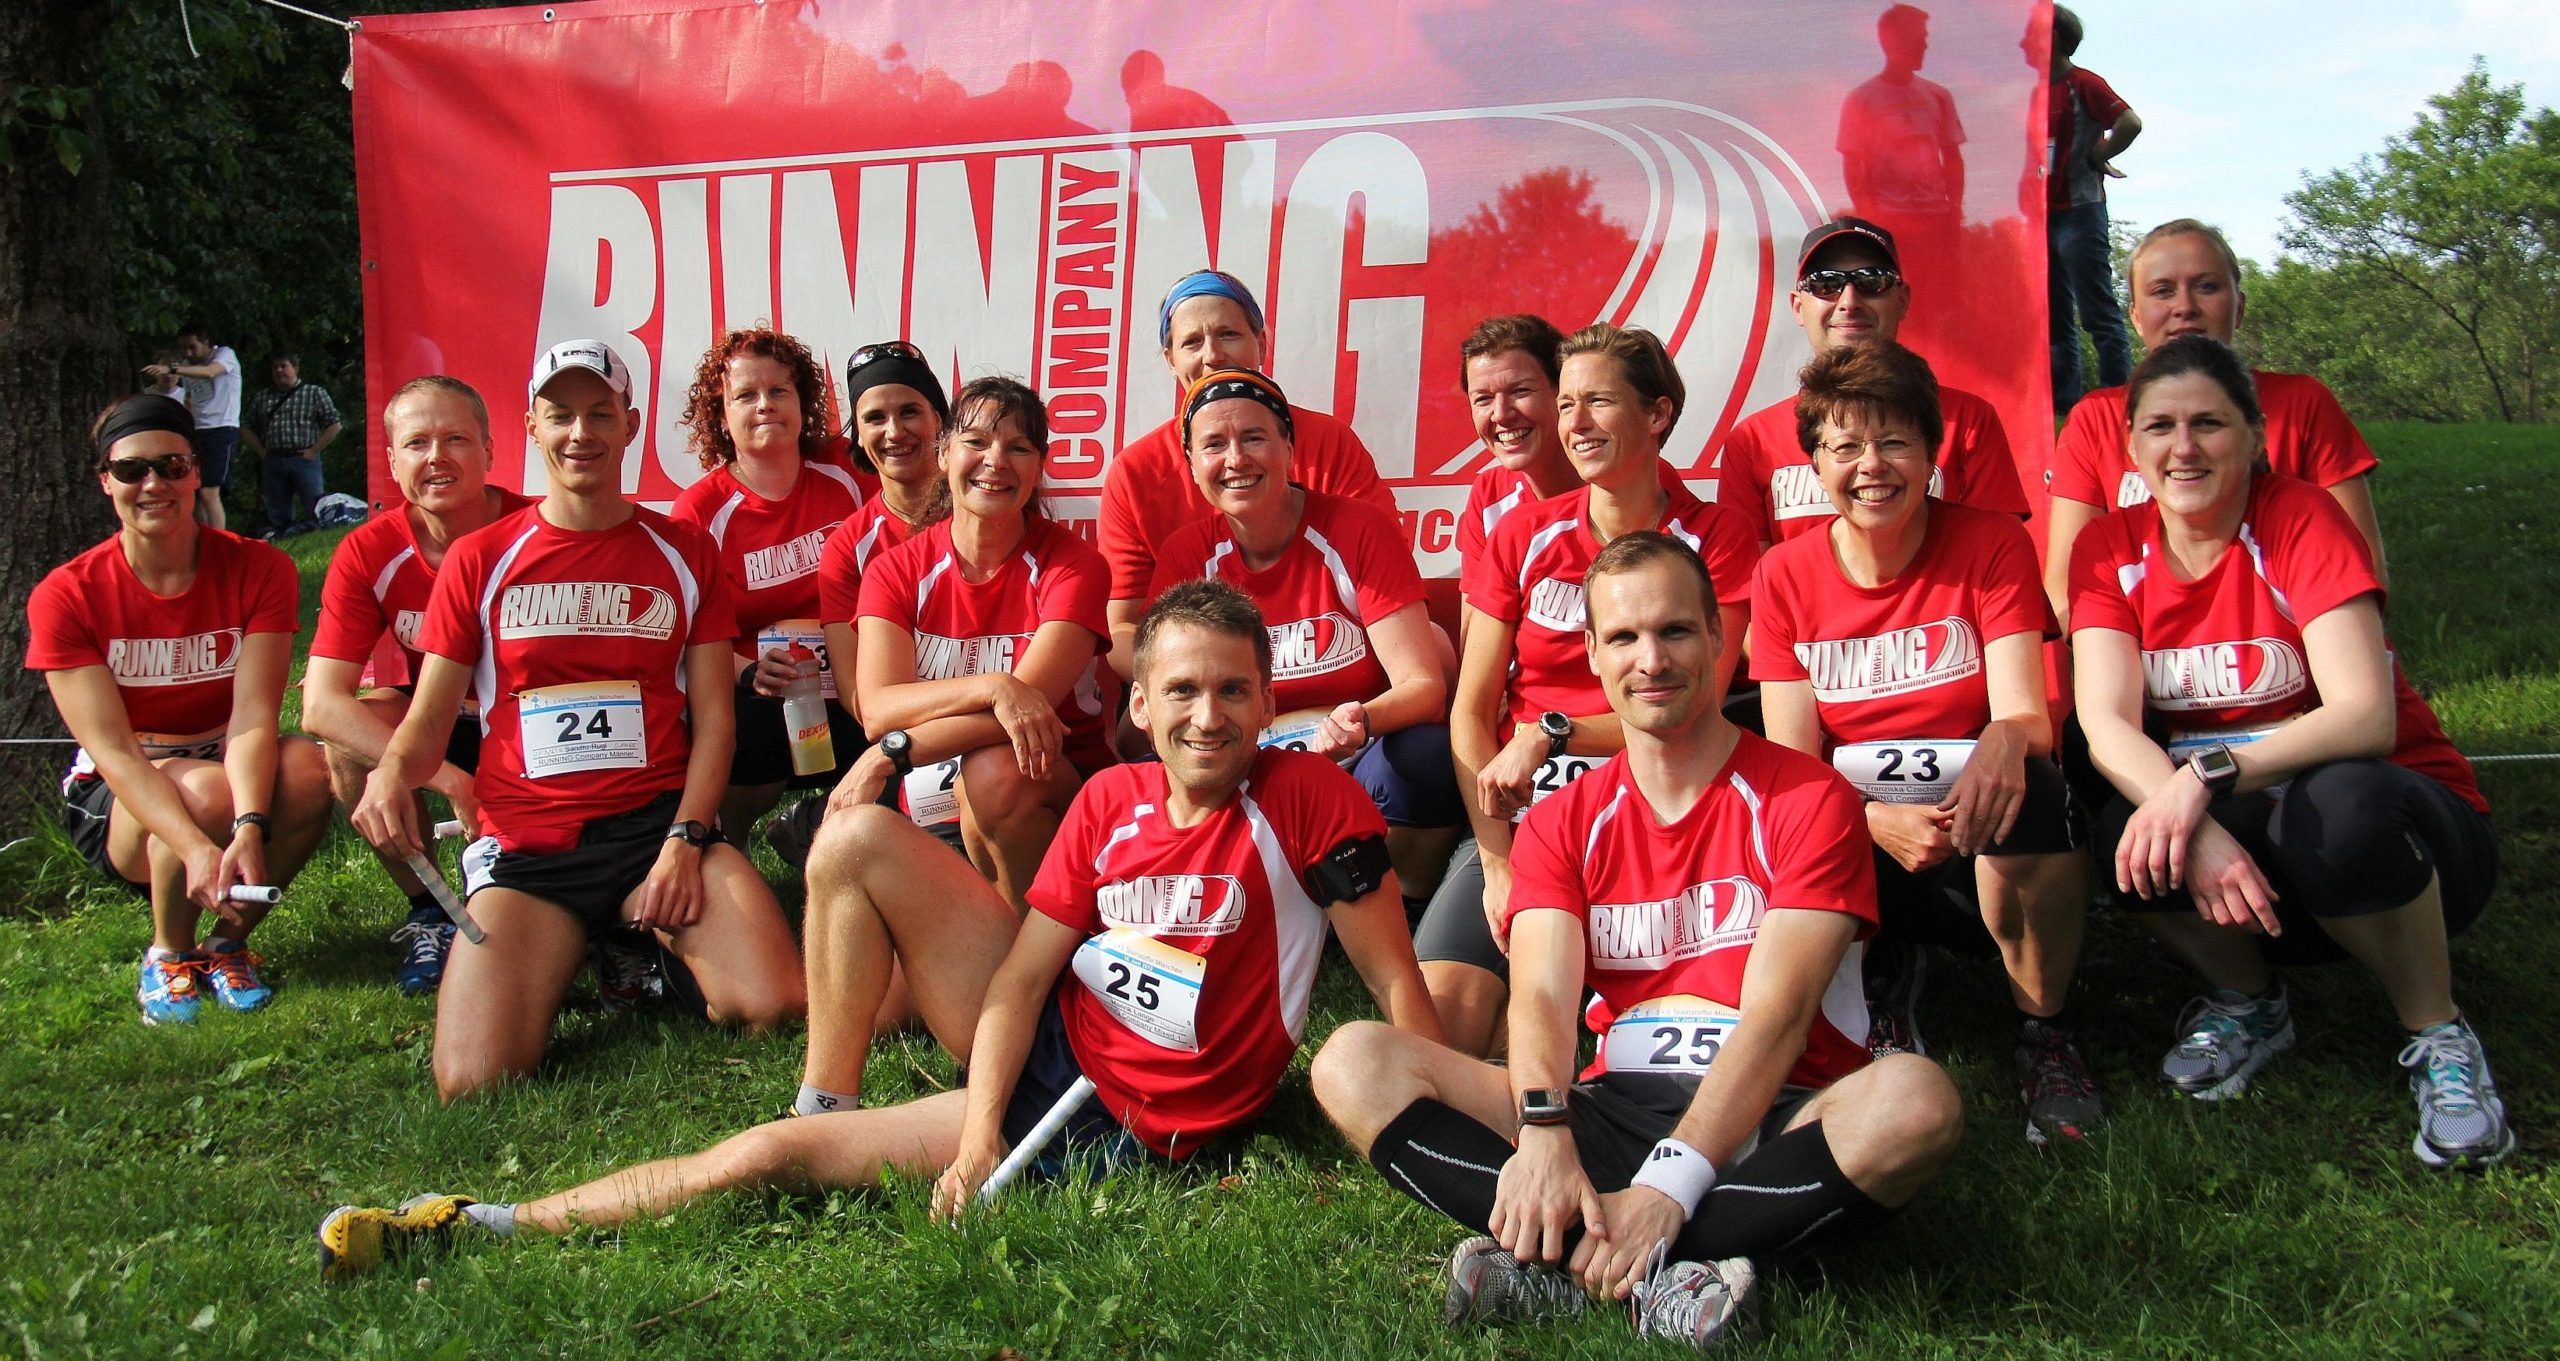 RUNNING Company Laufschule Teamerlebnis